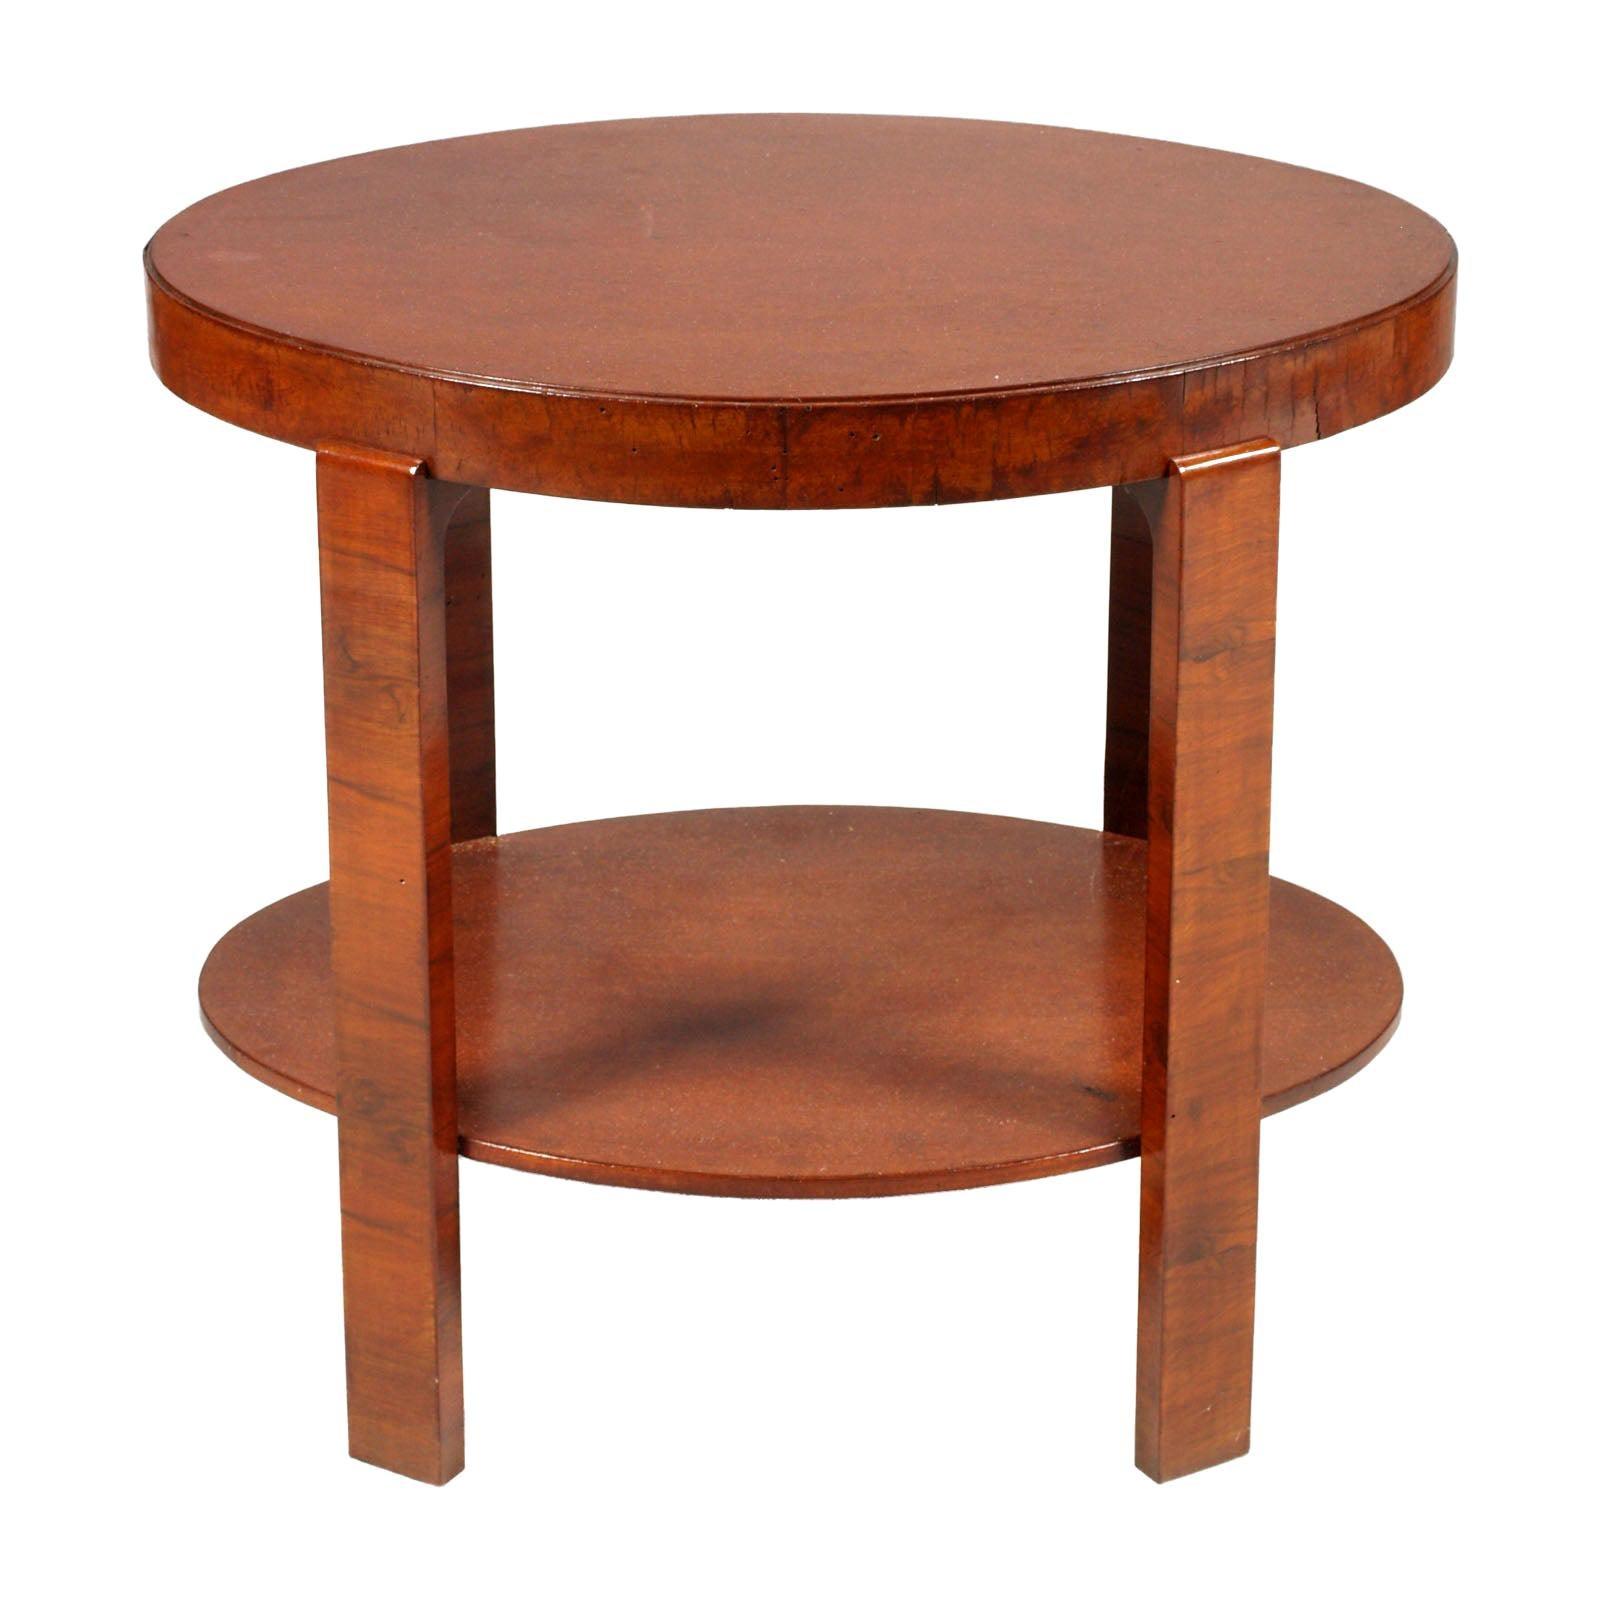 1930 Oval Side Table Coffee Table Art Deco by Osvaldo Borsani in Veneered Walnut